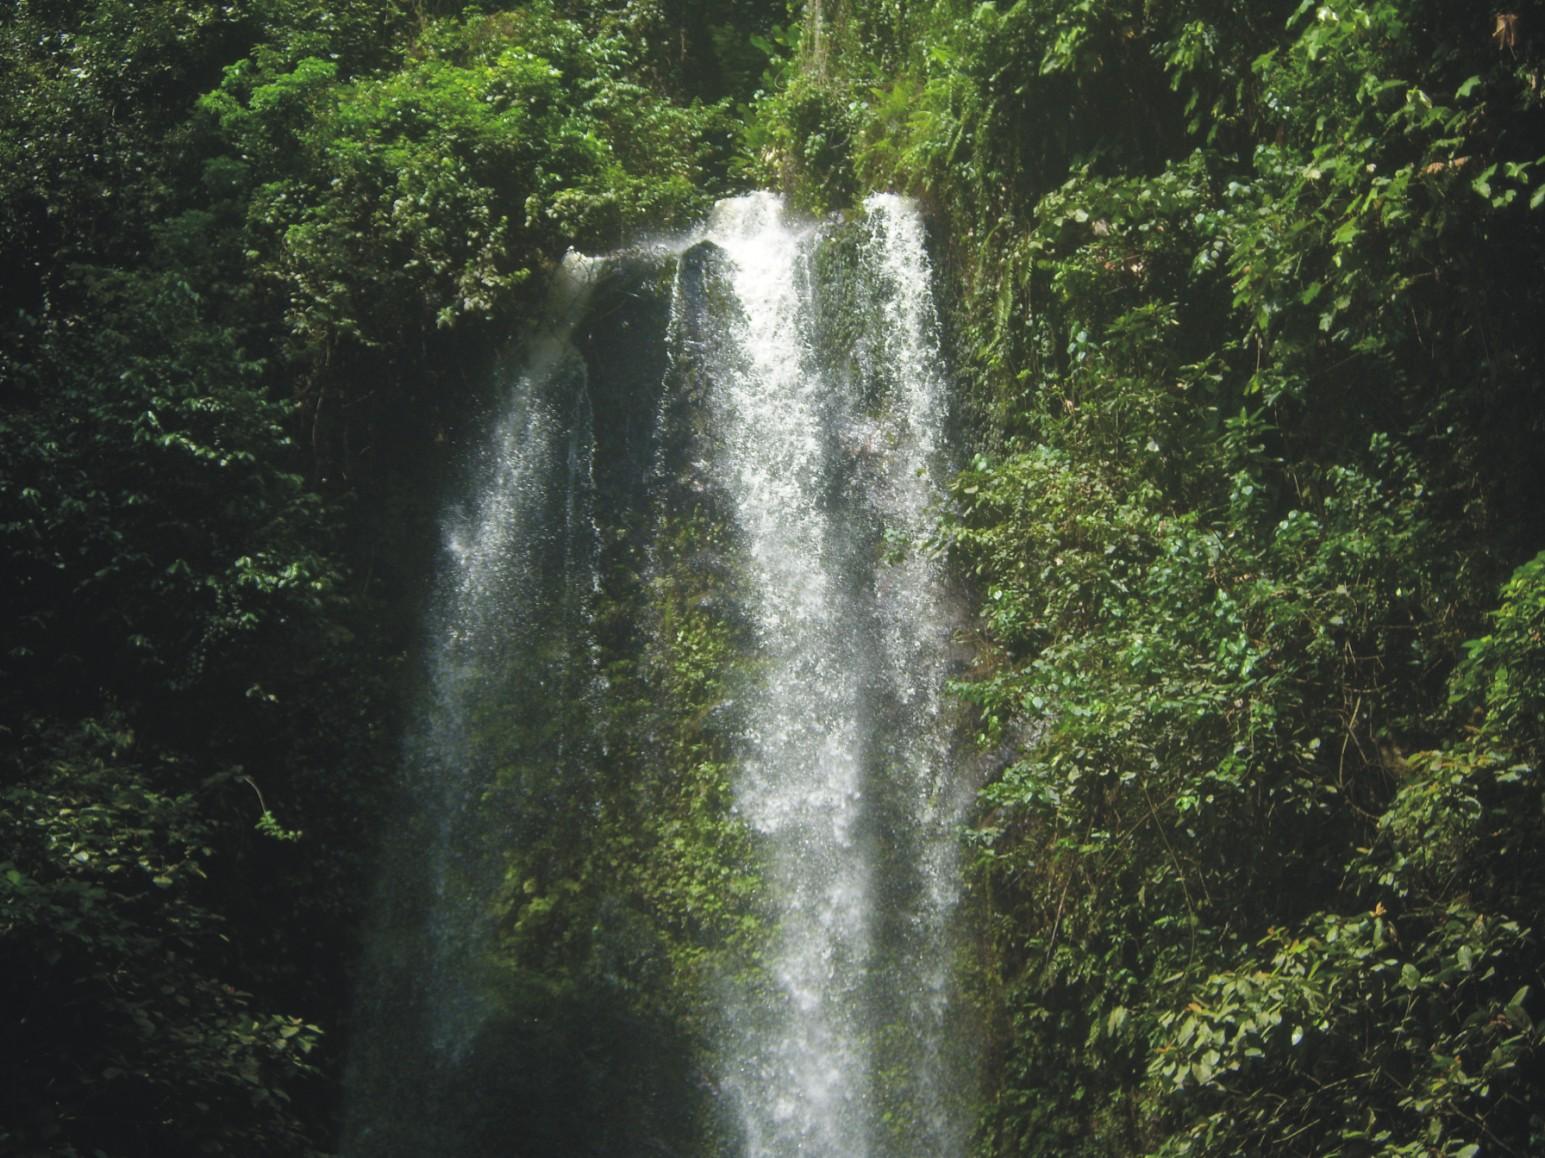 Erin Ijesha waterfalls in Nigeria